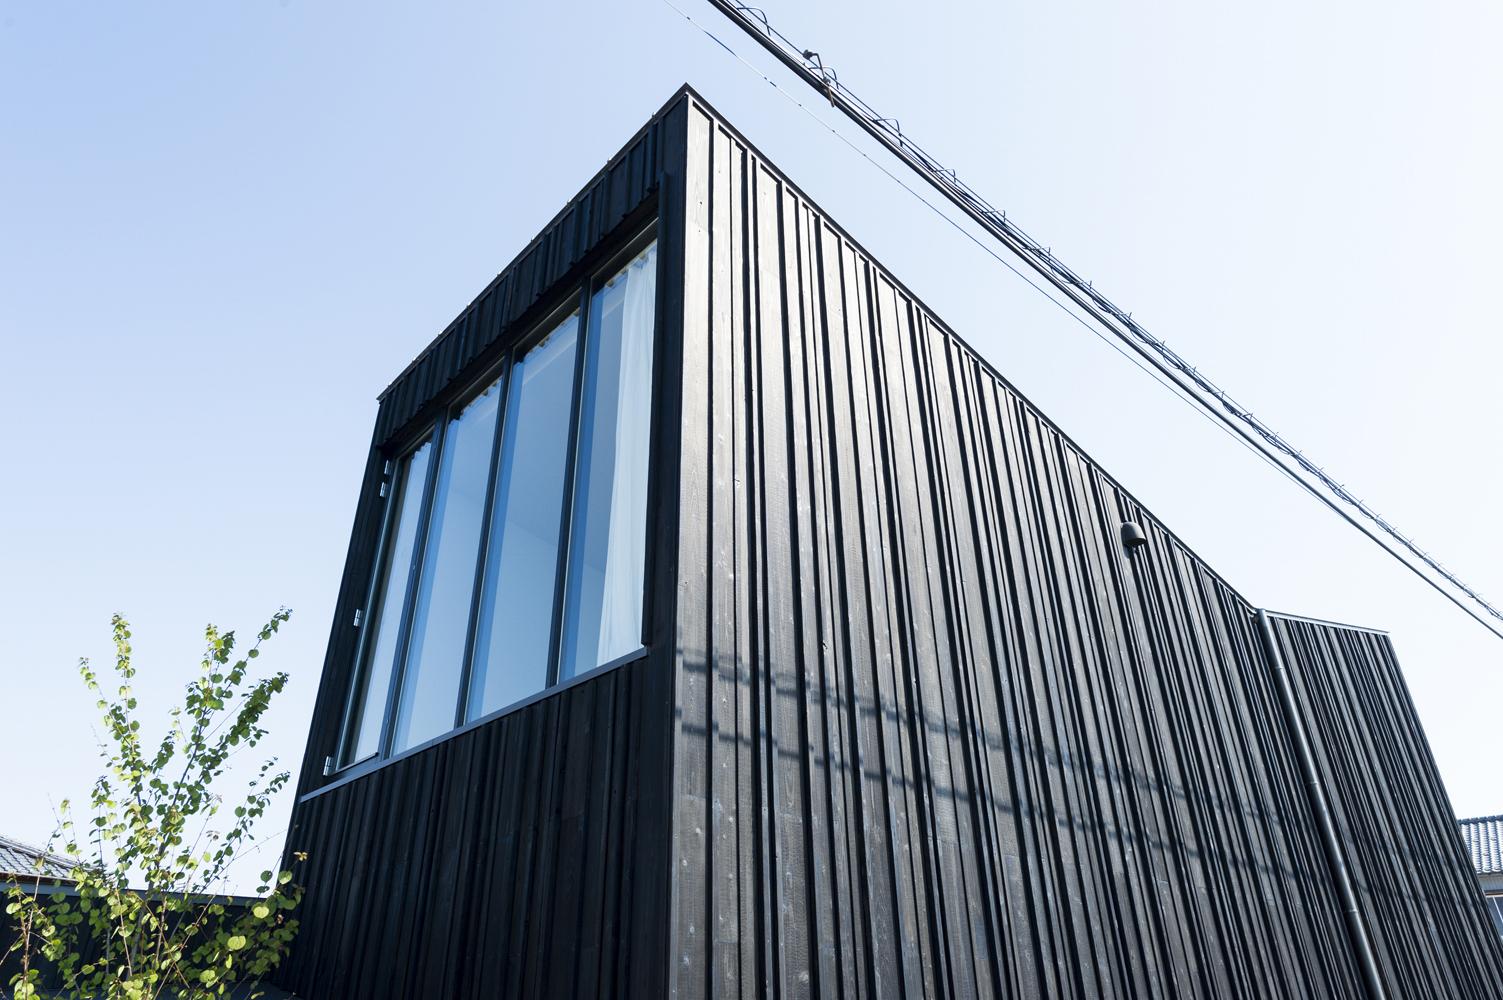 Courtyard House in Peach Garden in Niigata by Takeru Shoji Architects